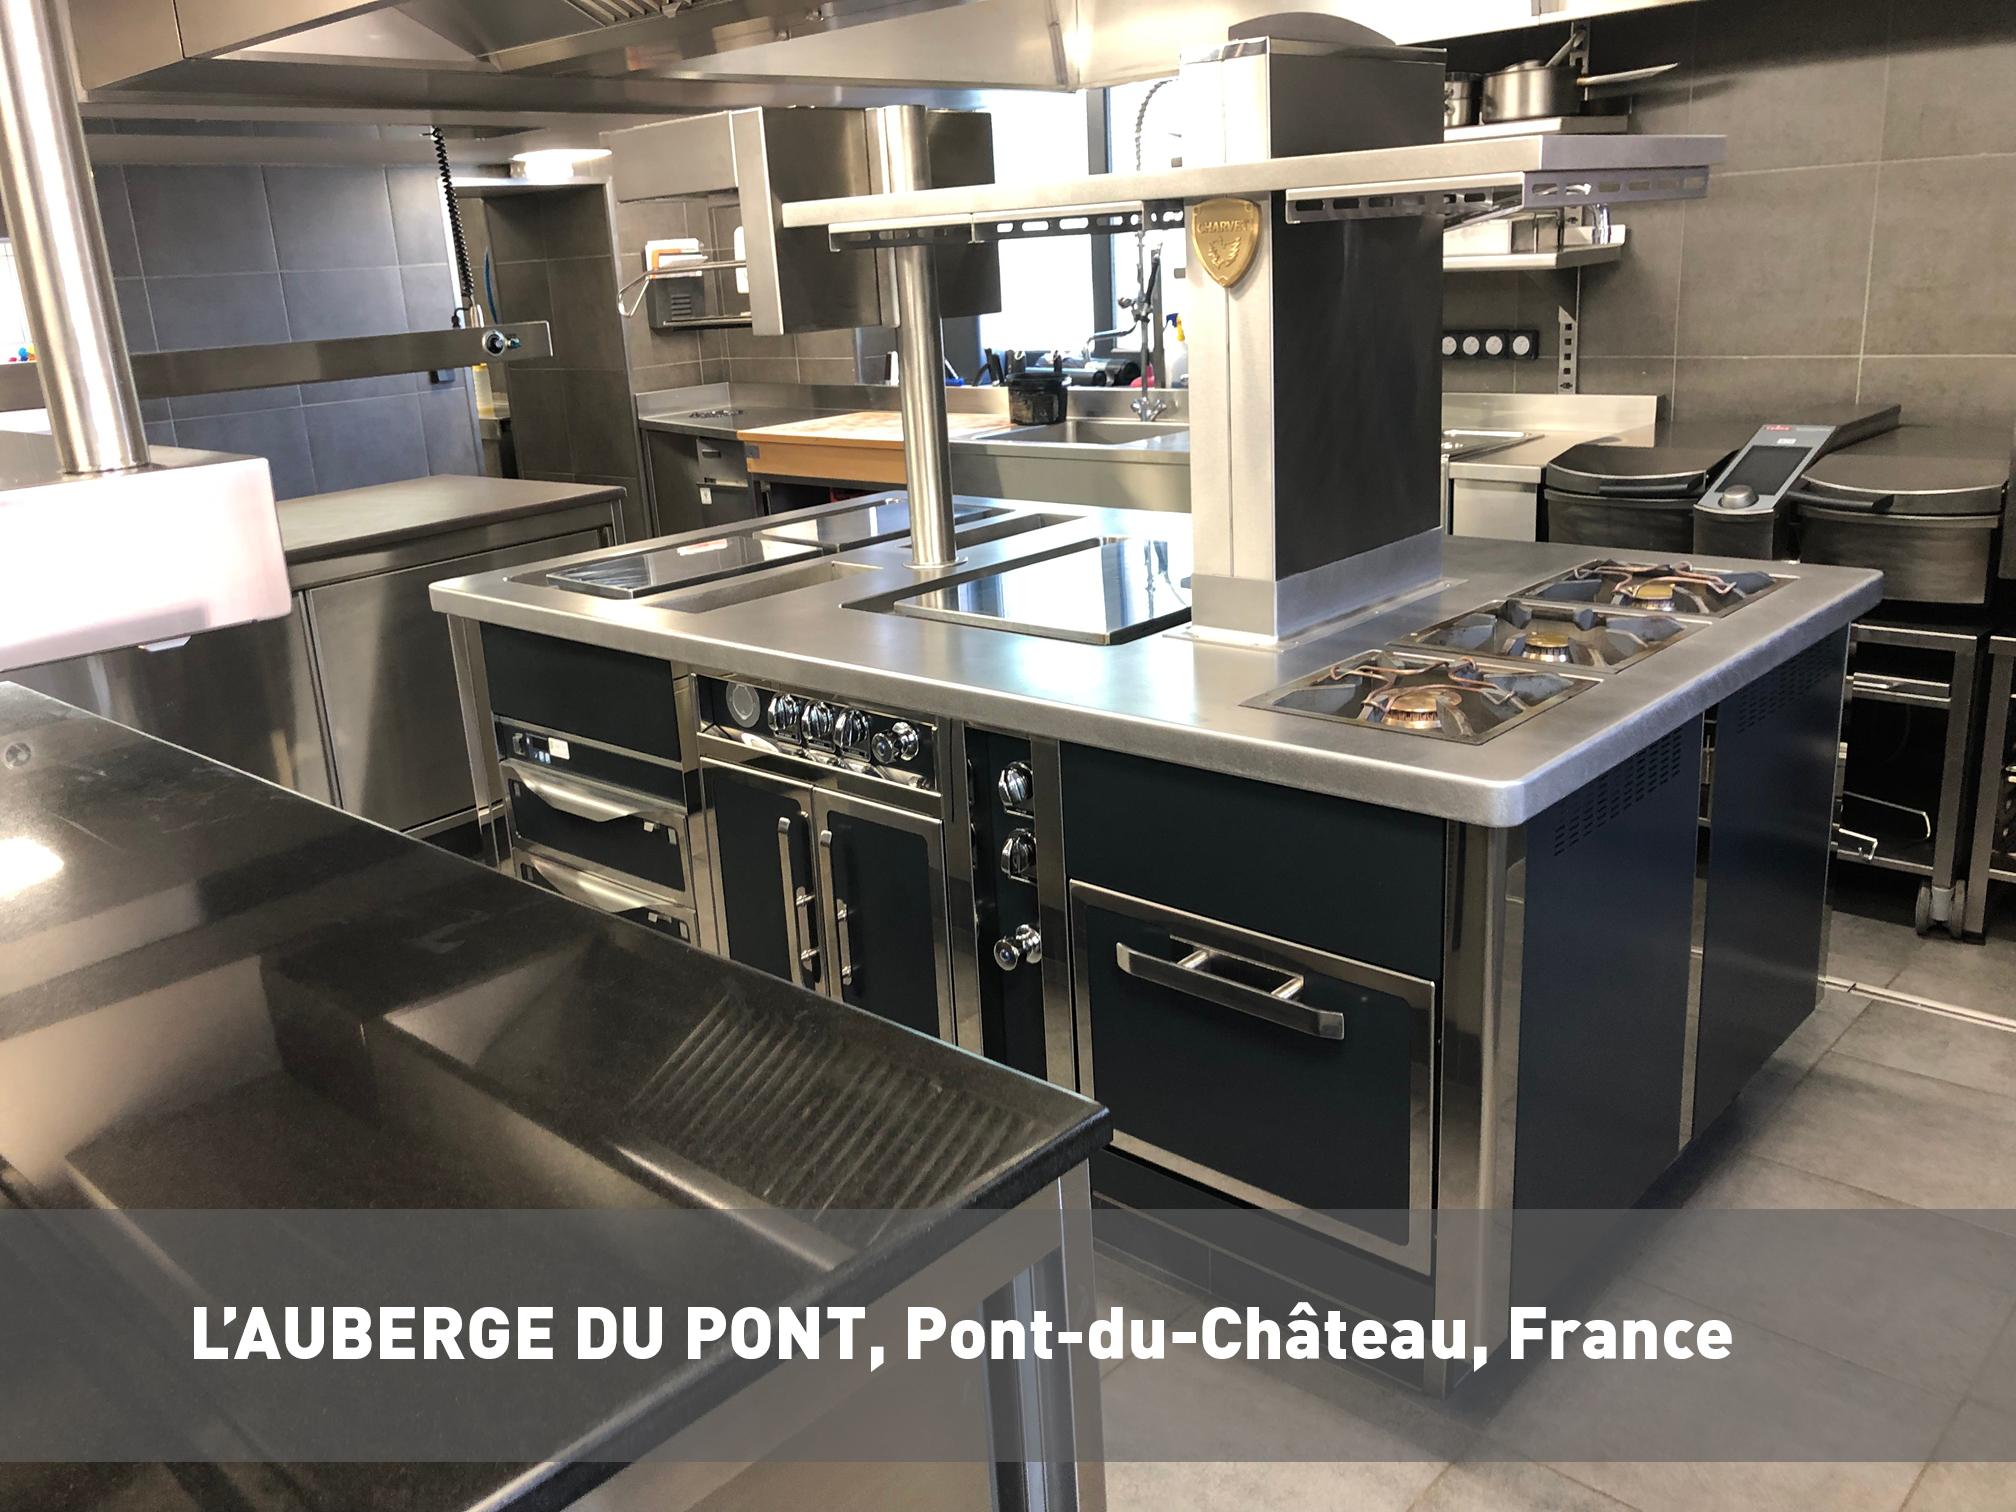 Auberge-du-pont-France